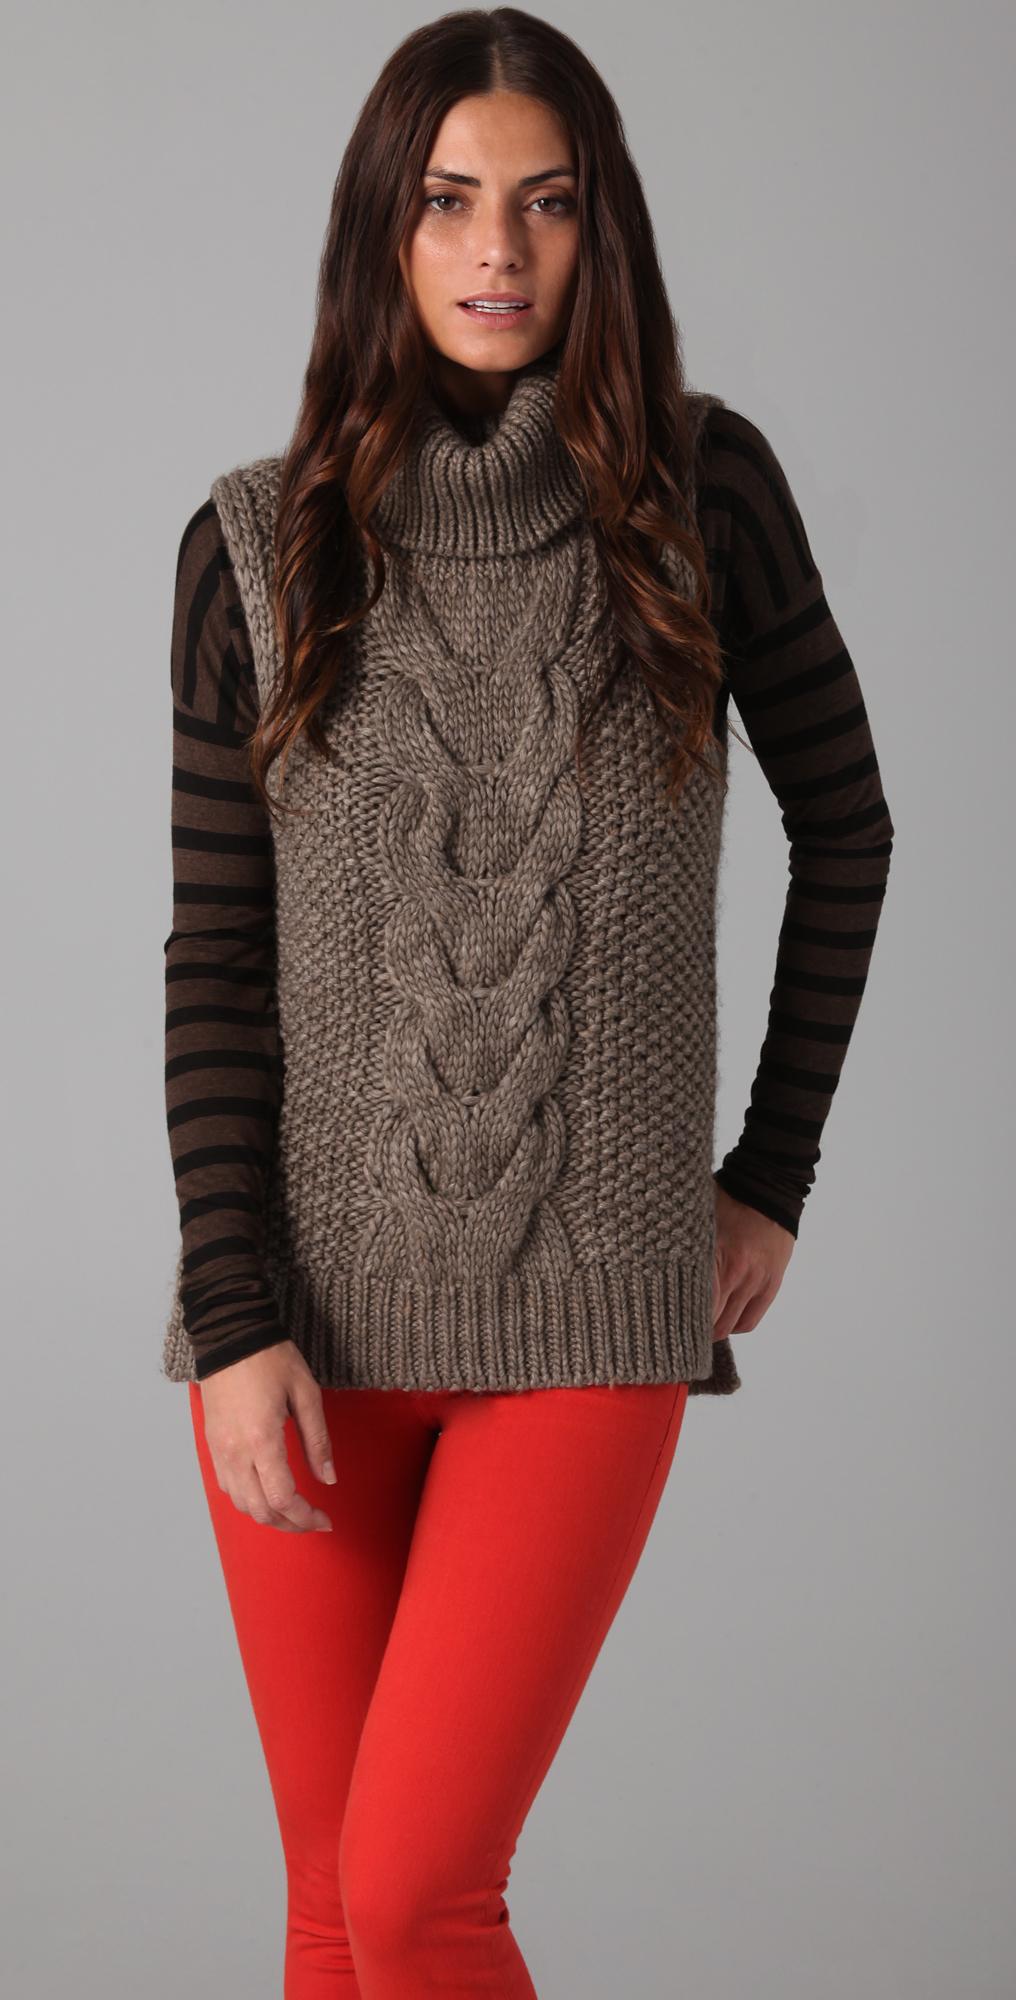 Jill Stuart Sorsele Iris Sleeveless Sweater Shopbop